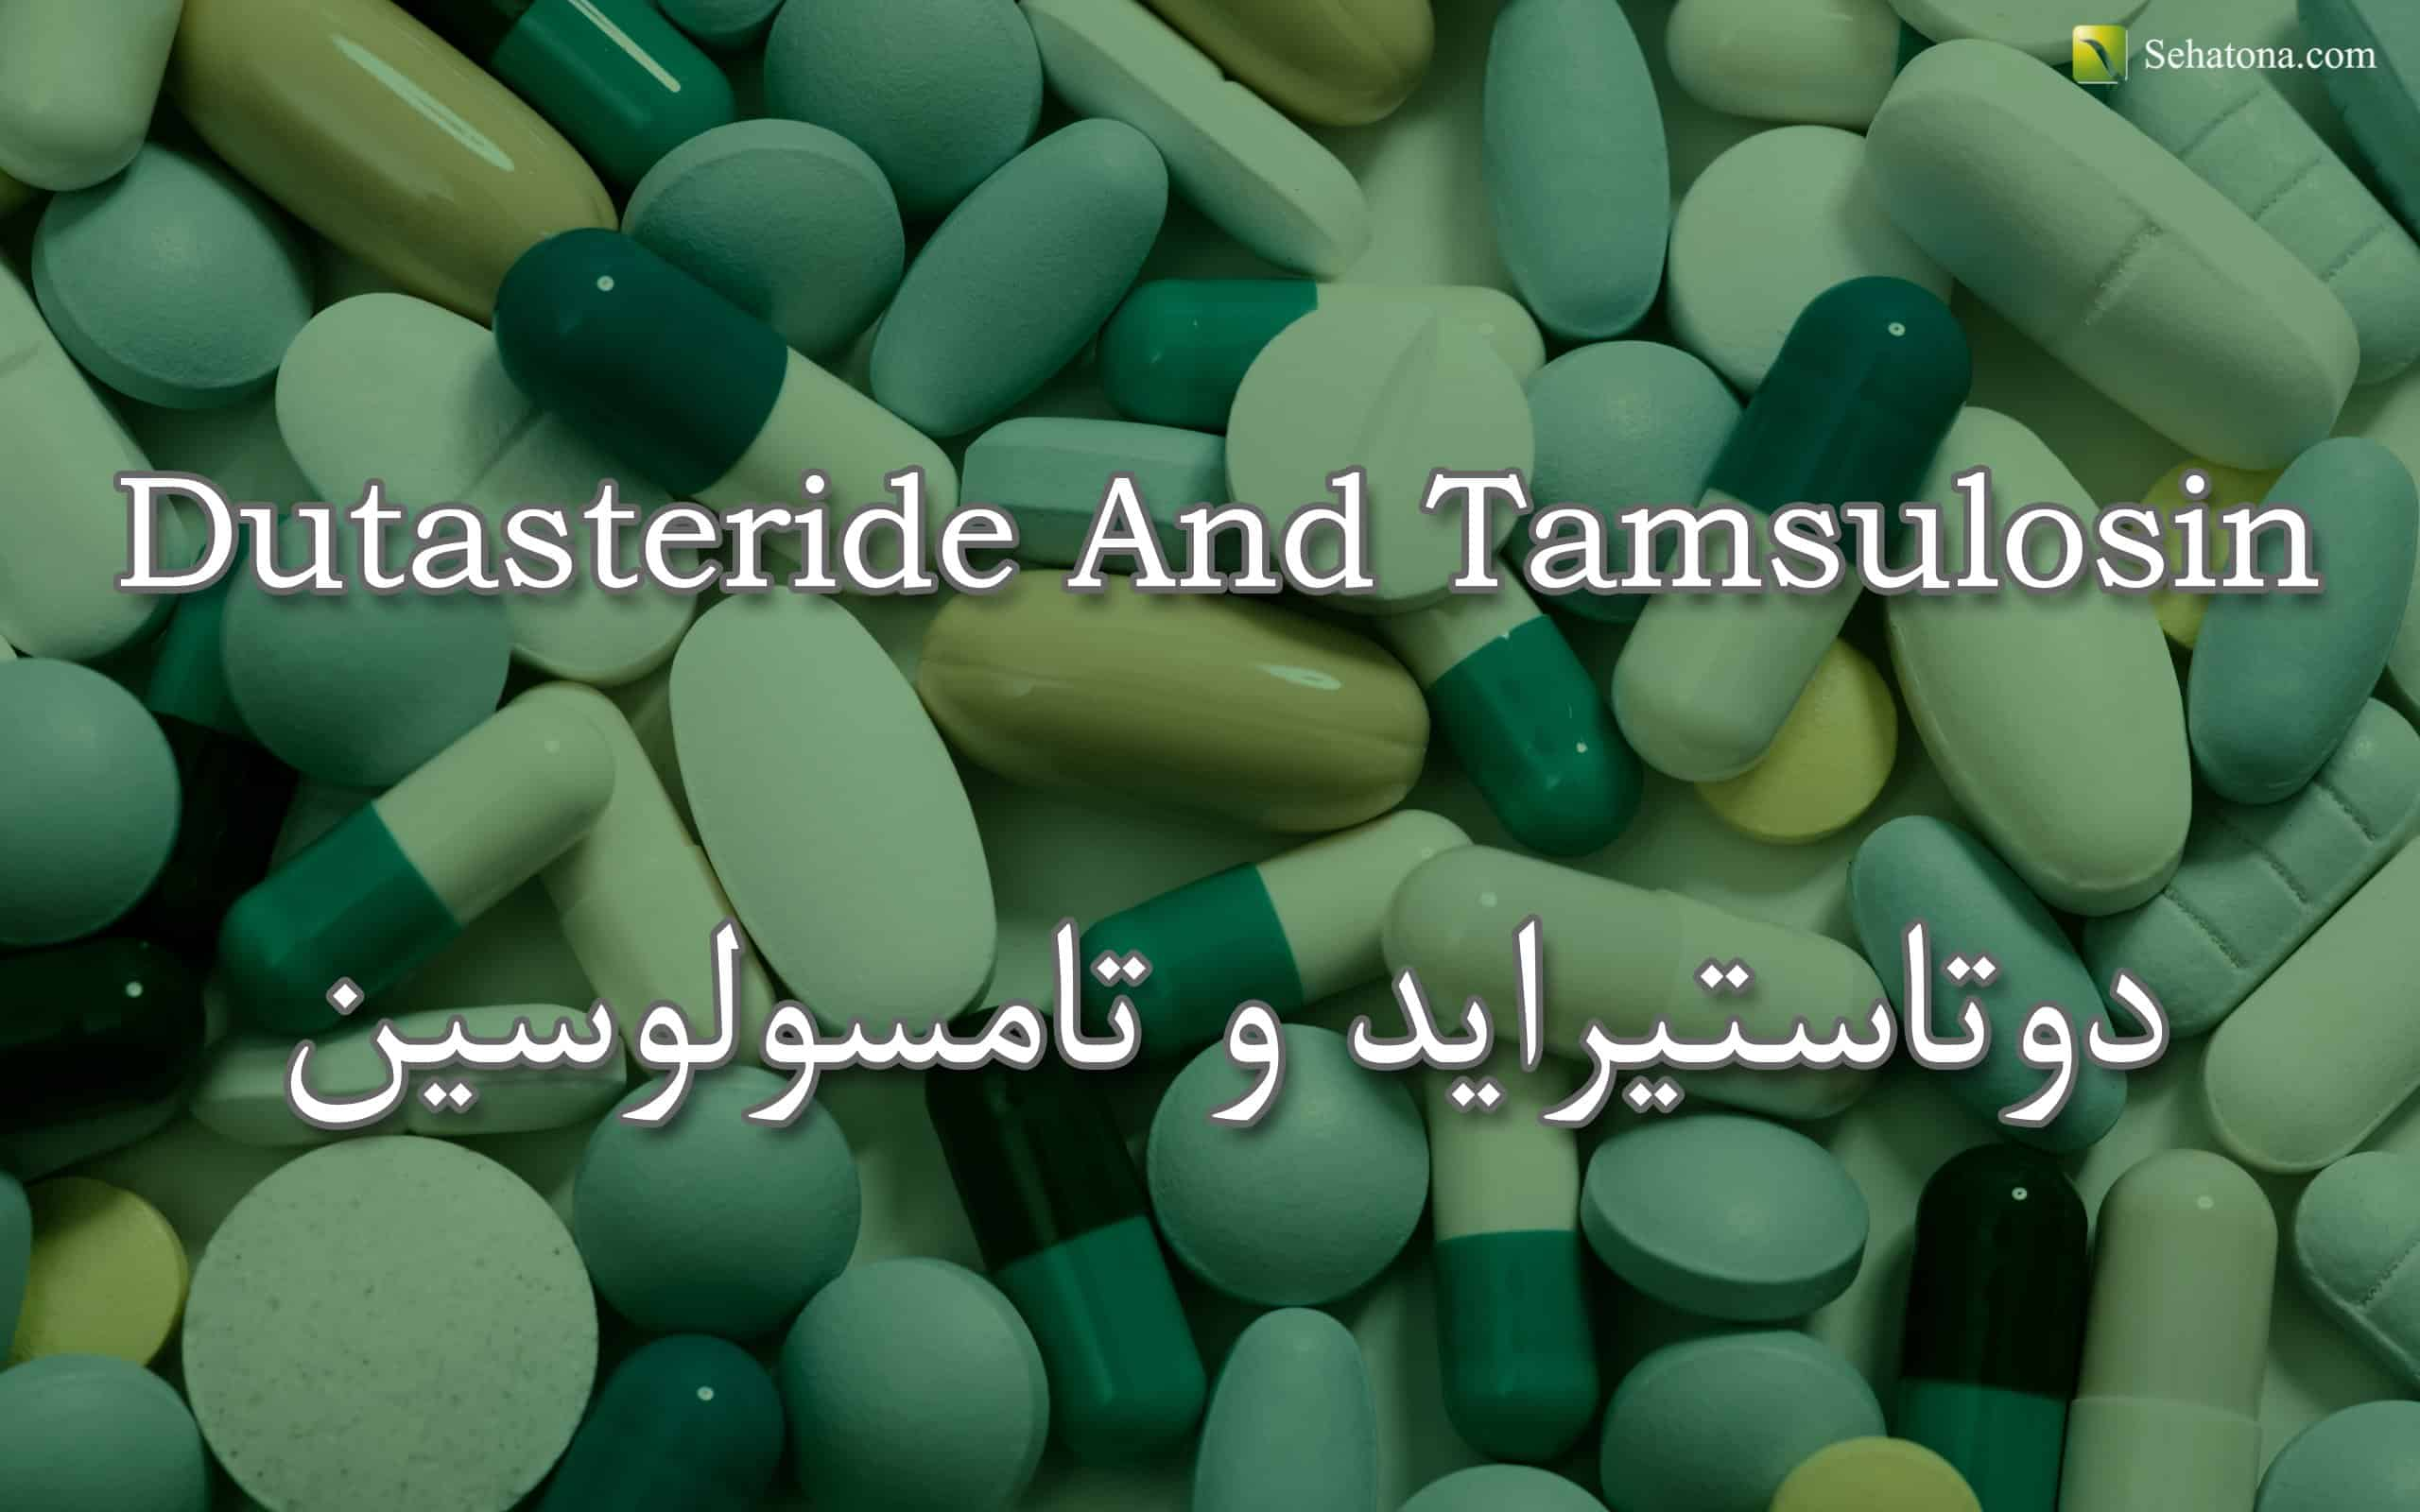 دوتاستيرايد و تامسولوسين Dutasteride And Tamsulosin